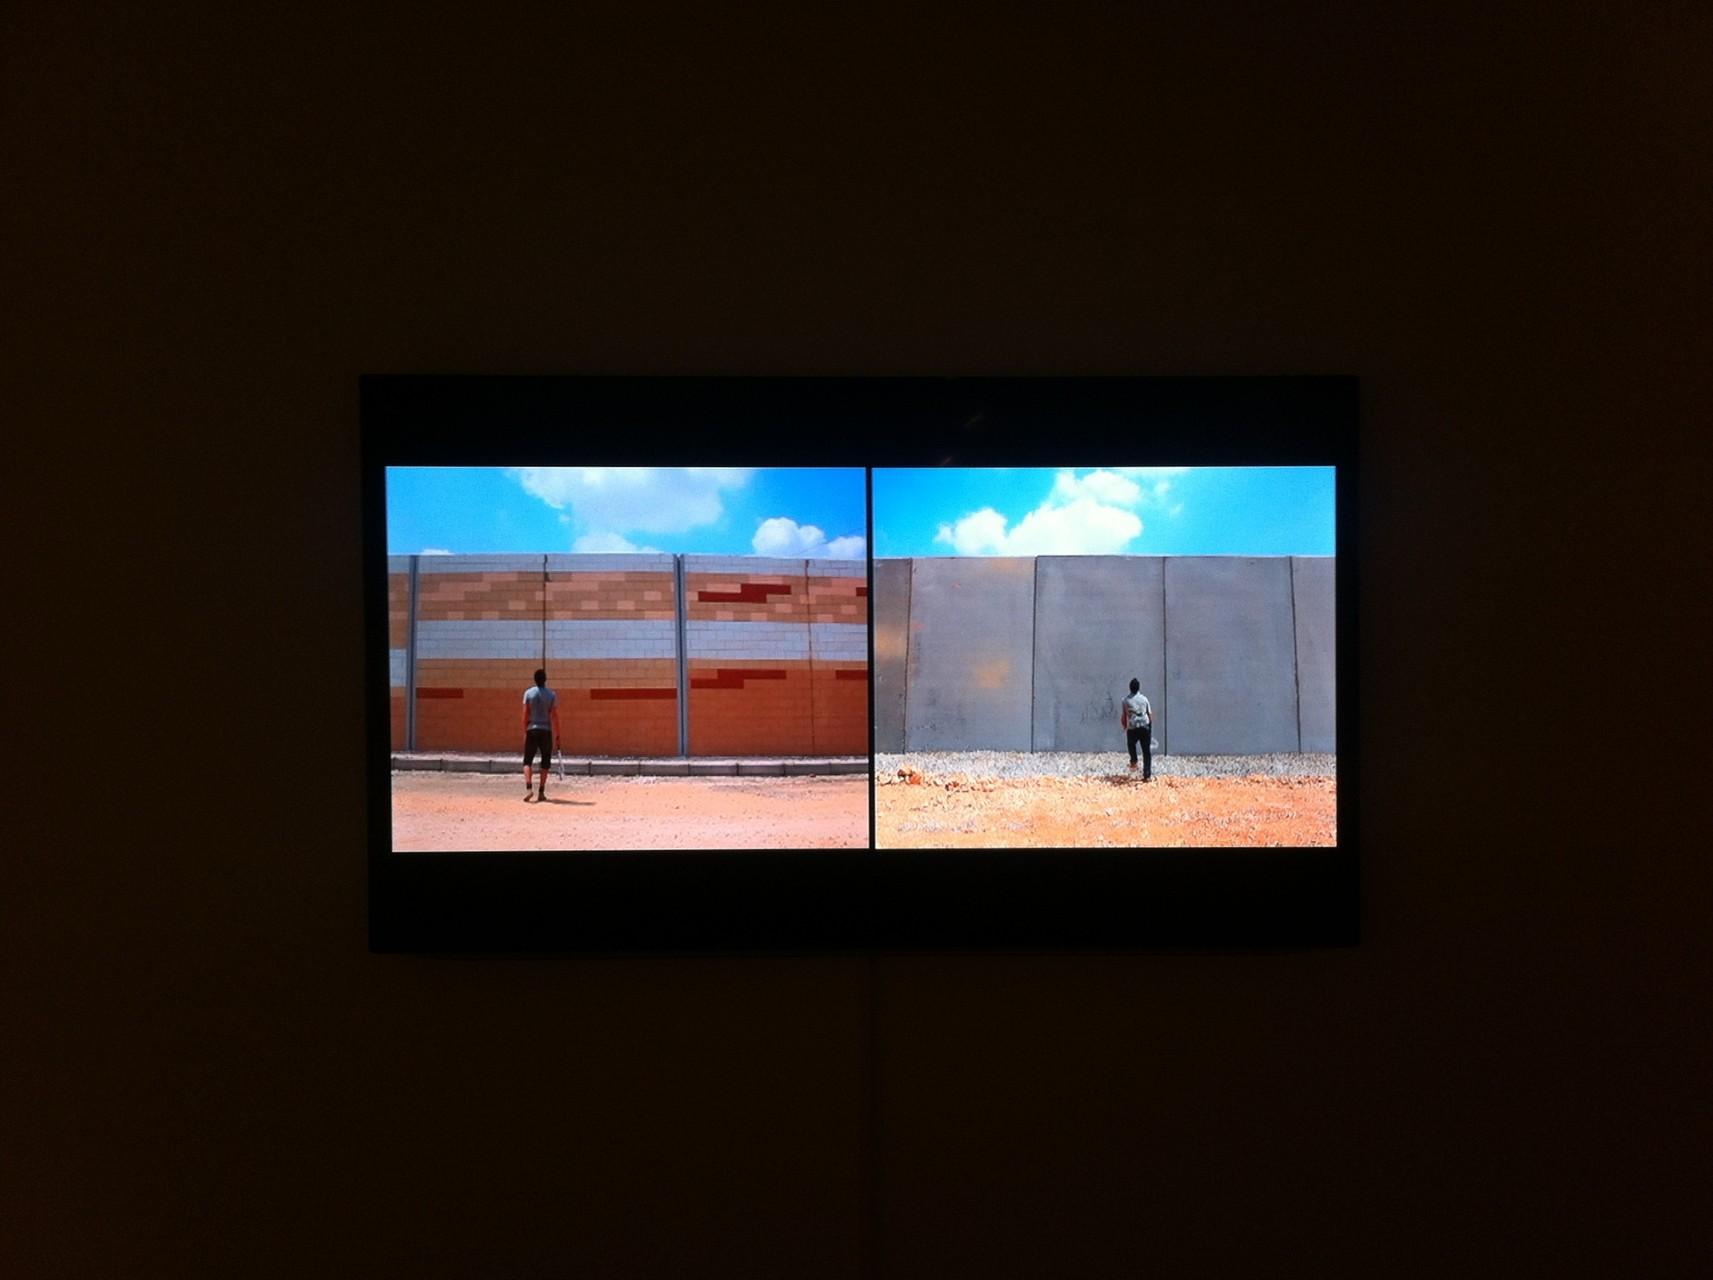 Whole in the Wall - Khaled Jarrar